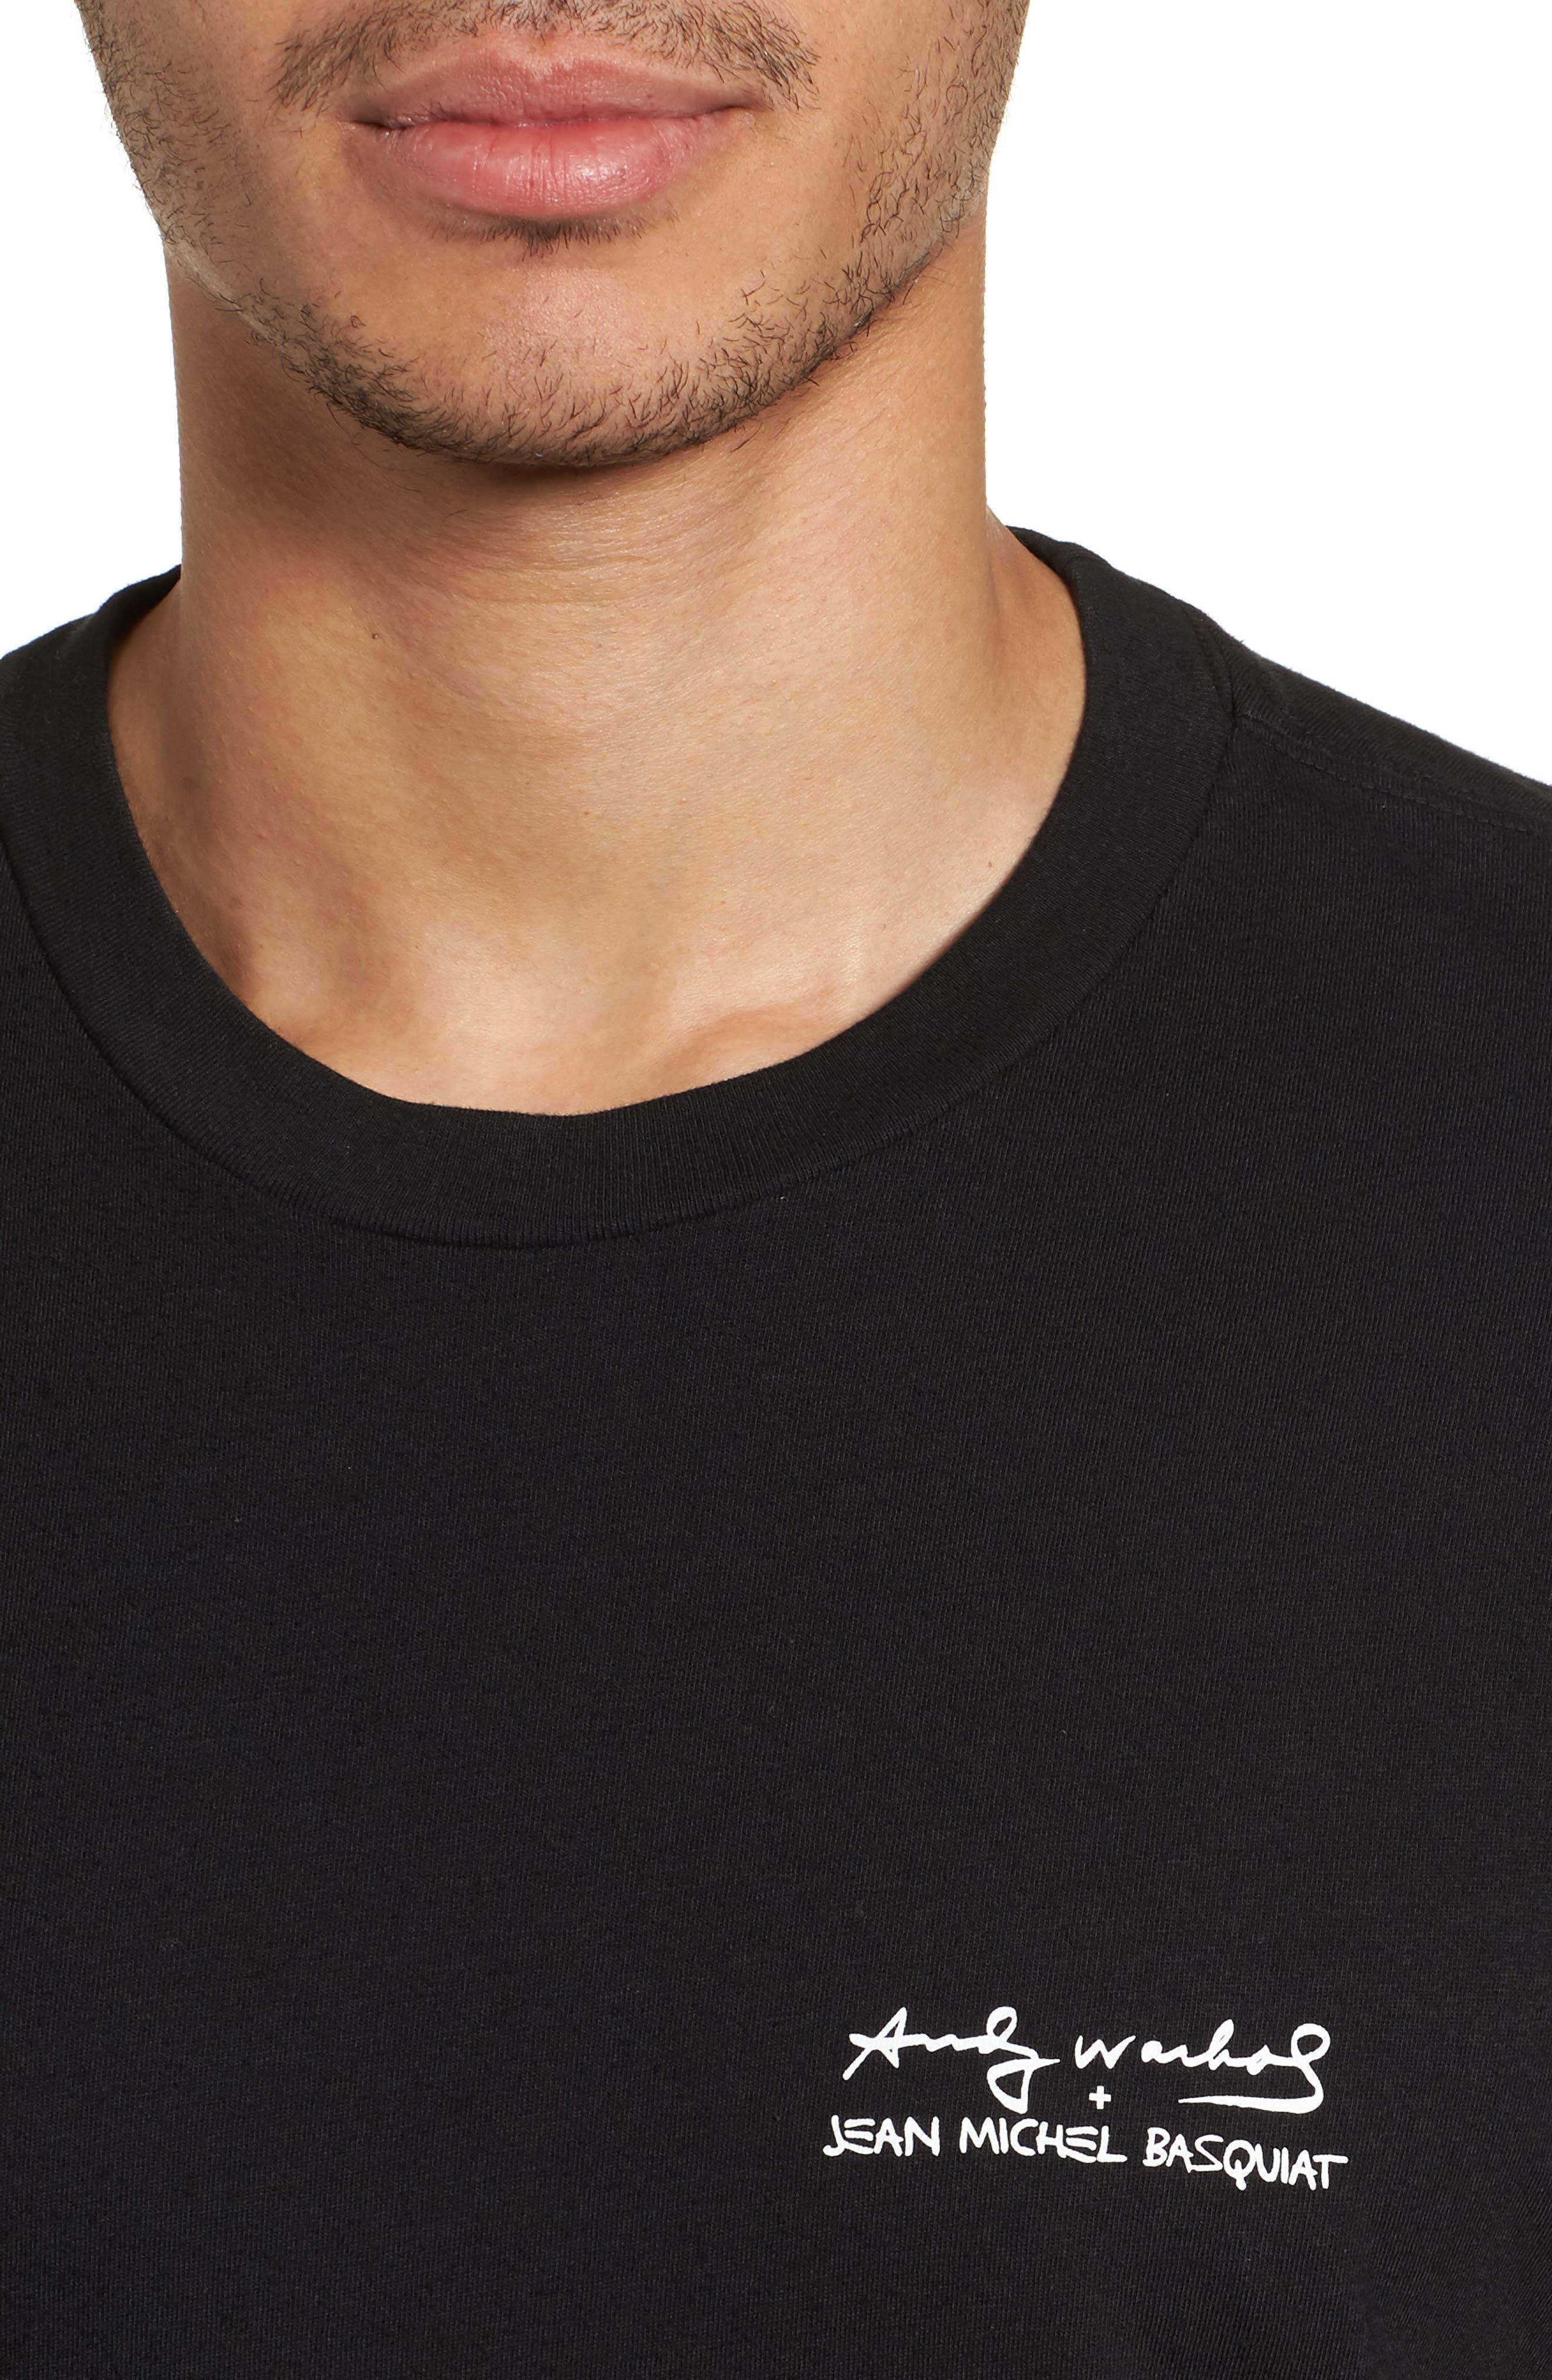 Fright Wig T-Shirt,                             Alternate thumbnail 4, color,                             Black